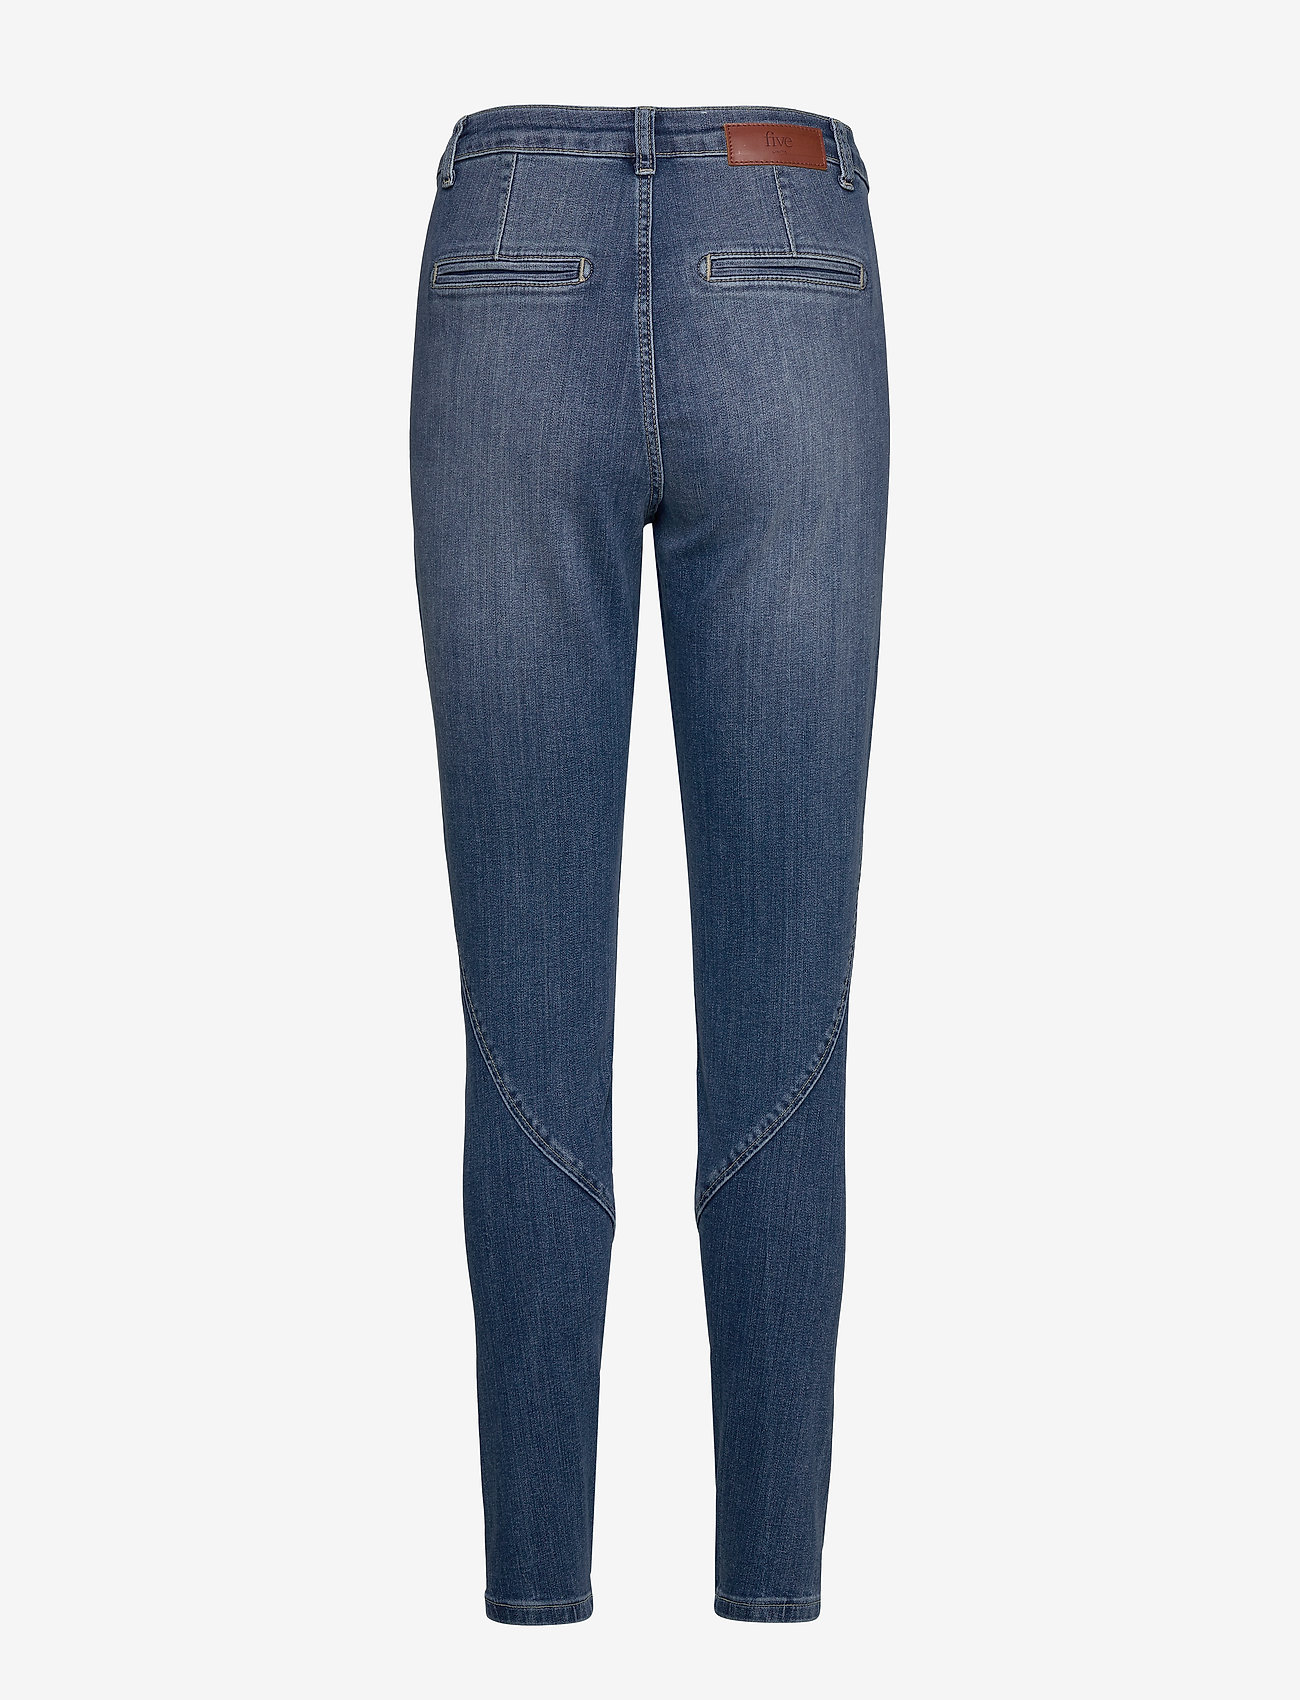 FIVEUNITS - Jolie 544 - slim jeans - medium raini - 1